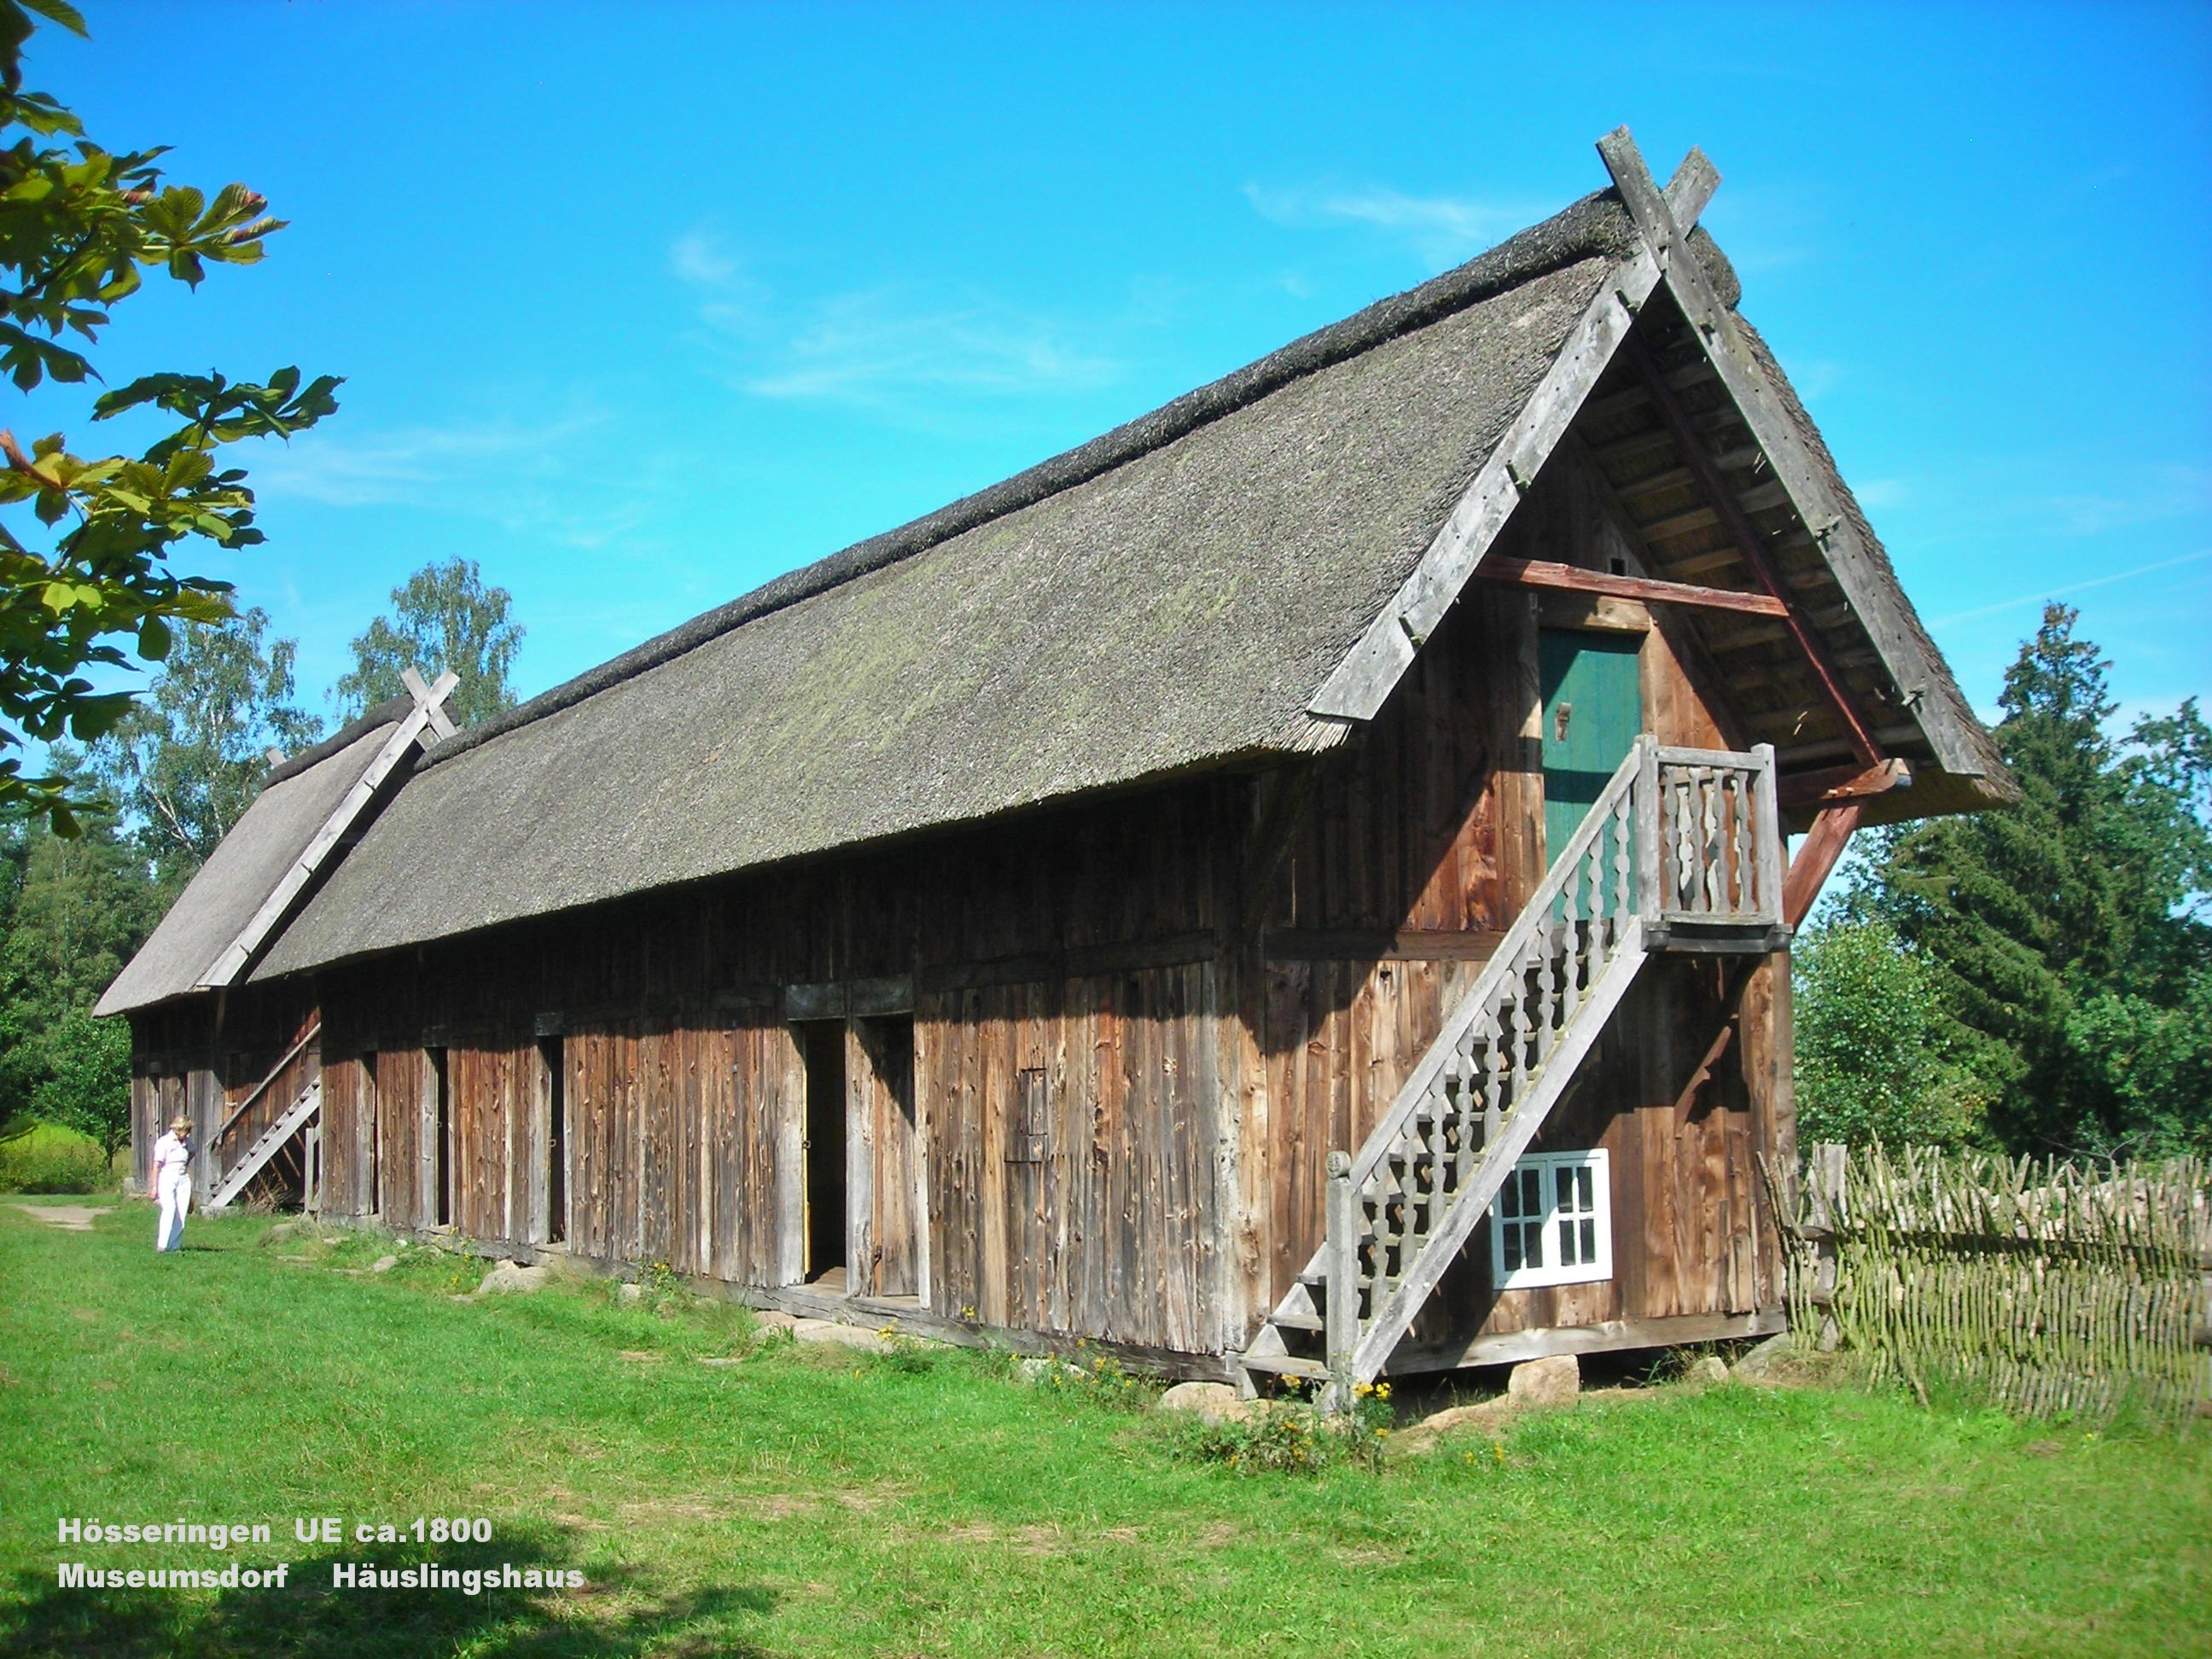 h-hoesseringen-ue-1860-haeuslingshaus-